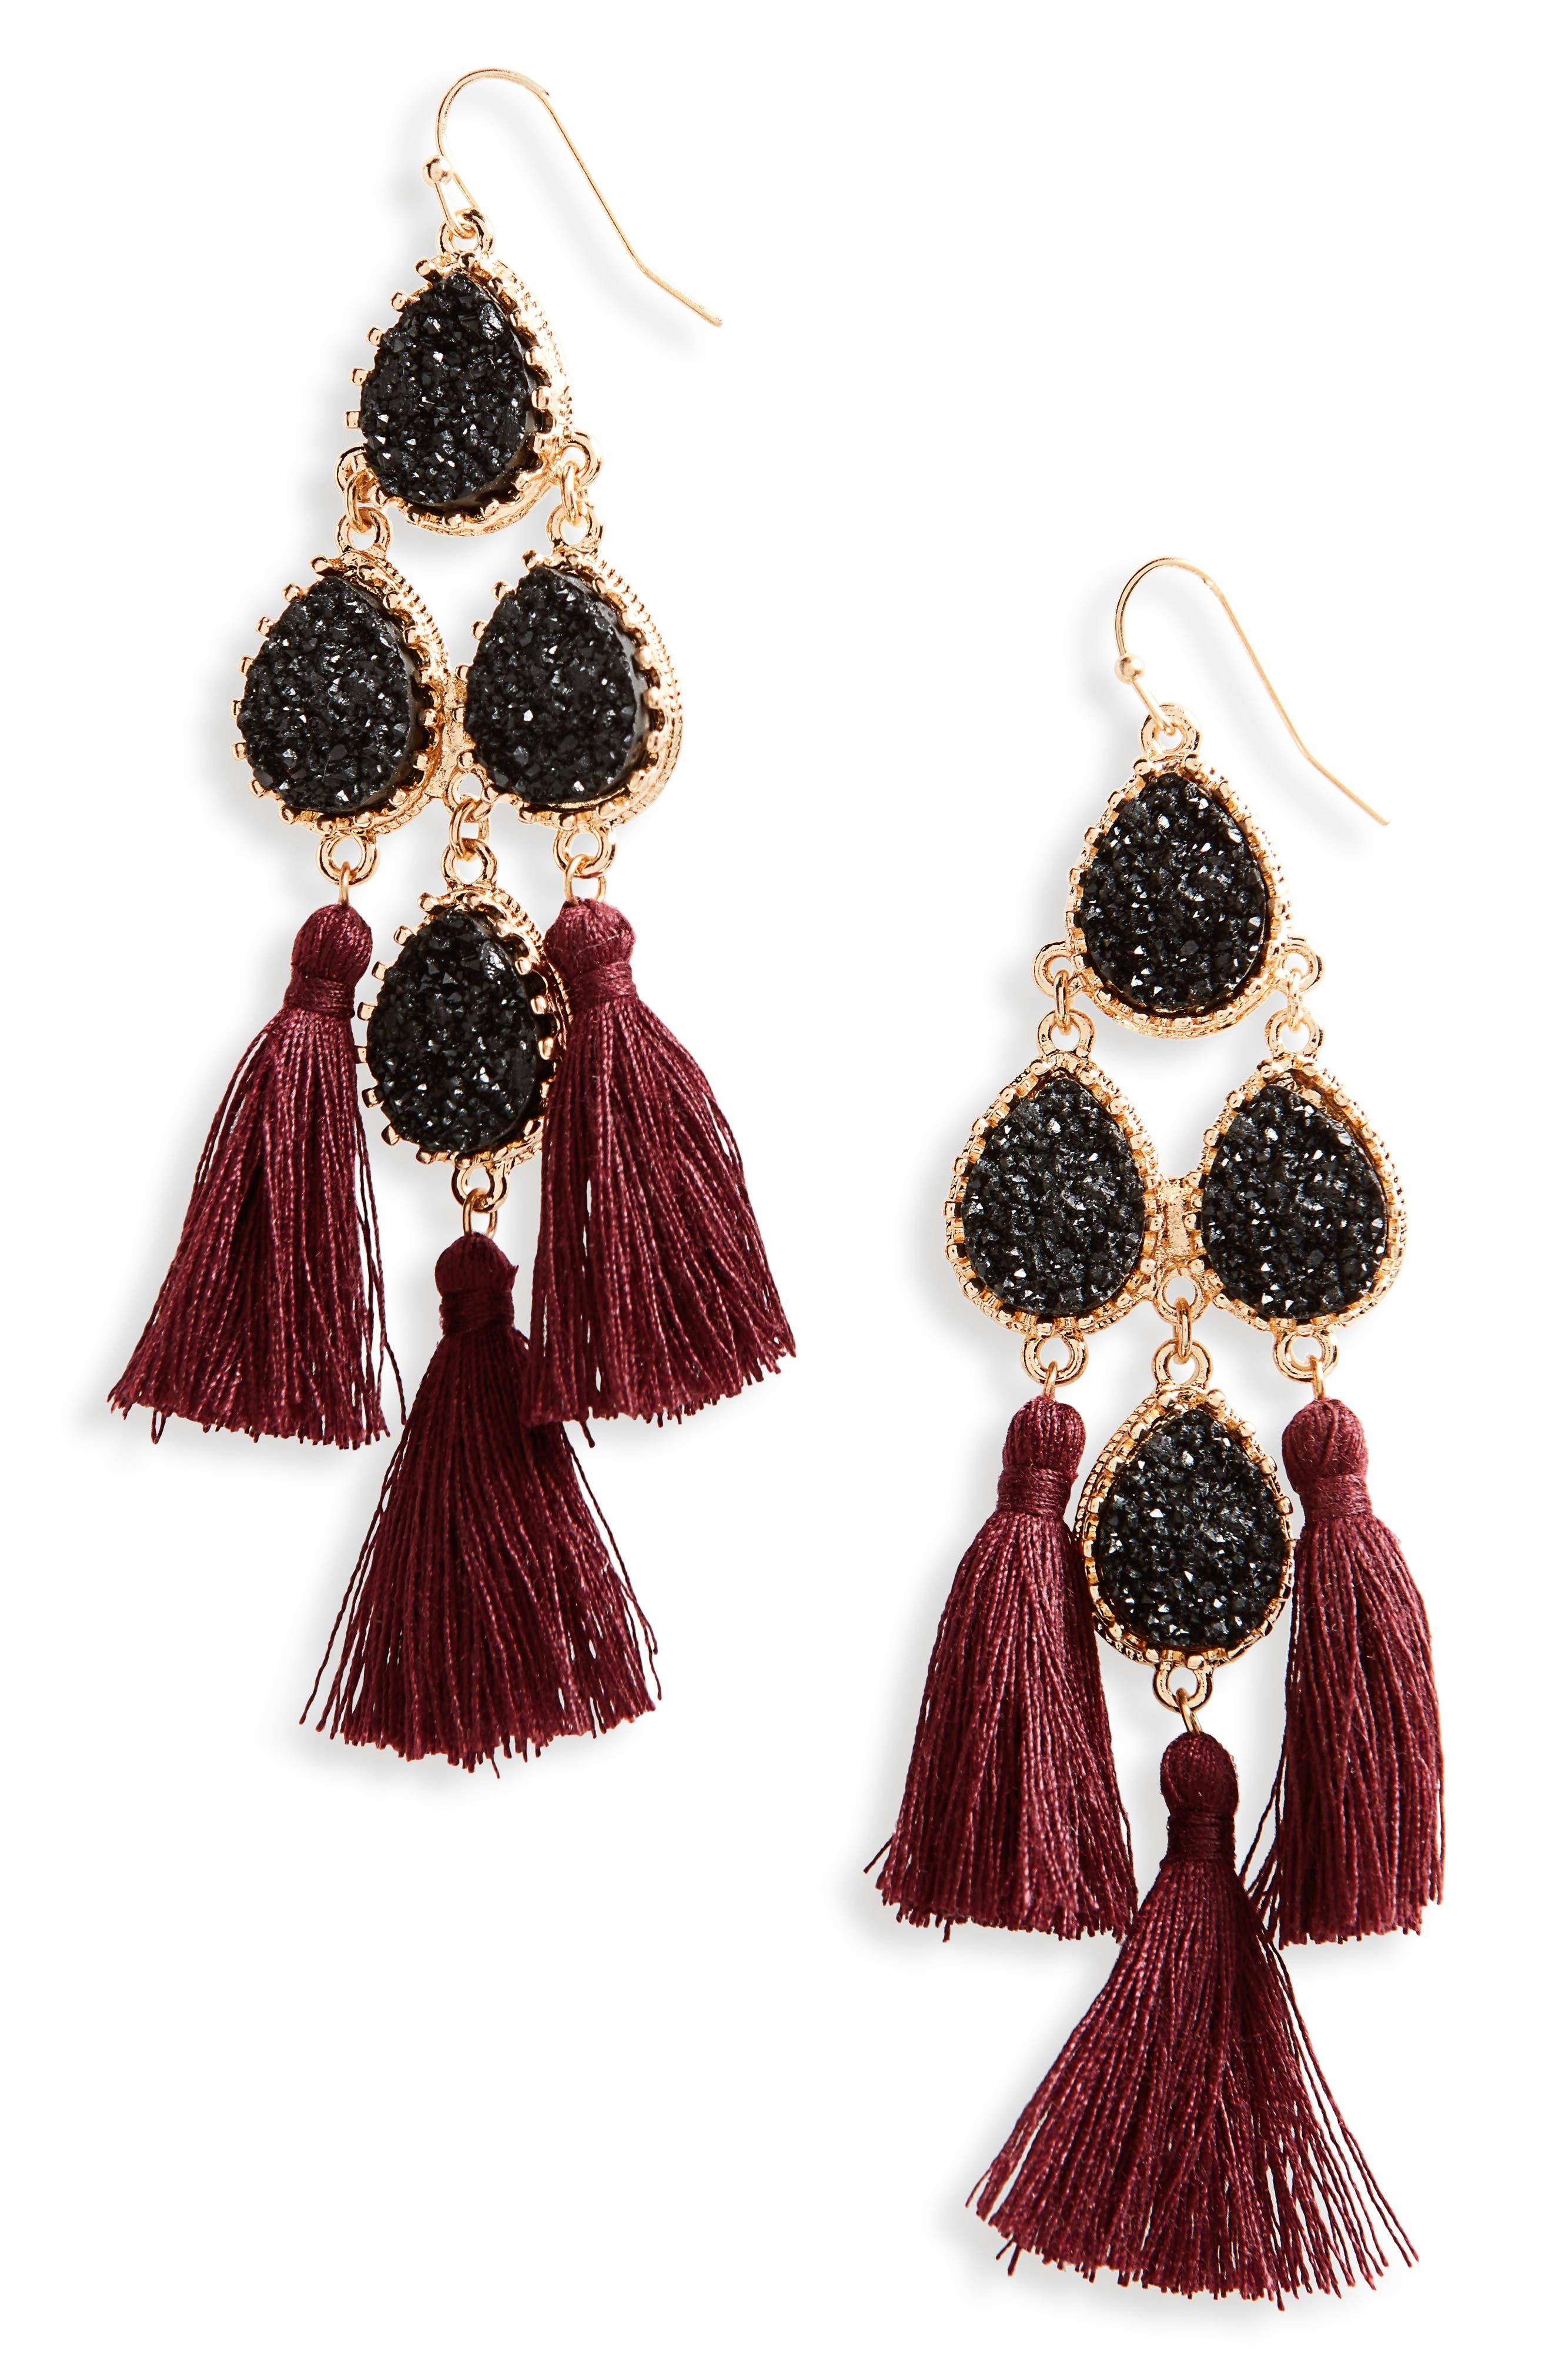 Panacea Mirror Embroidery Tassel Earrings R3mCf0